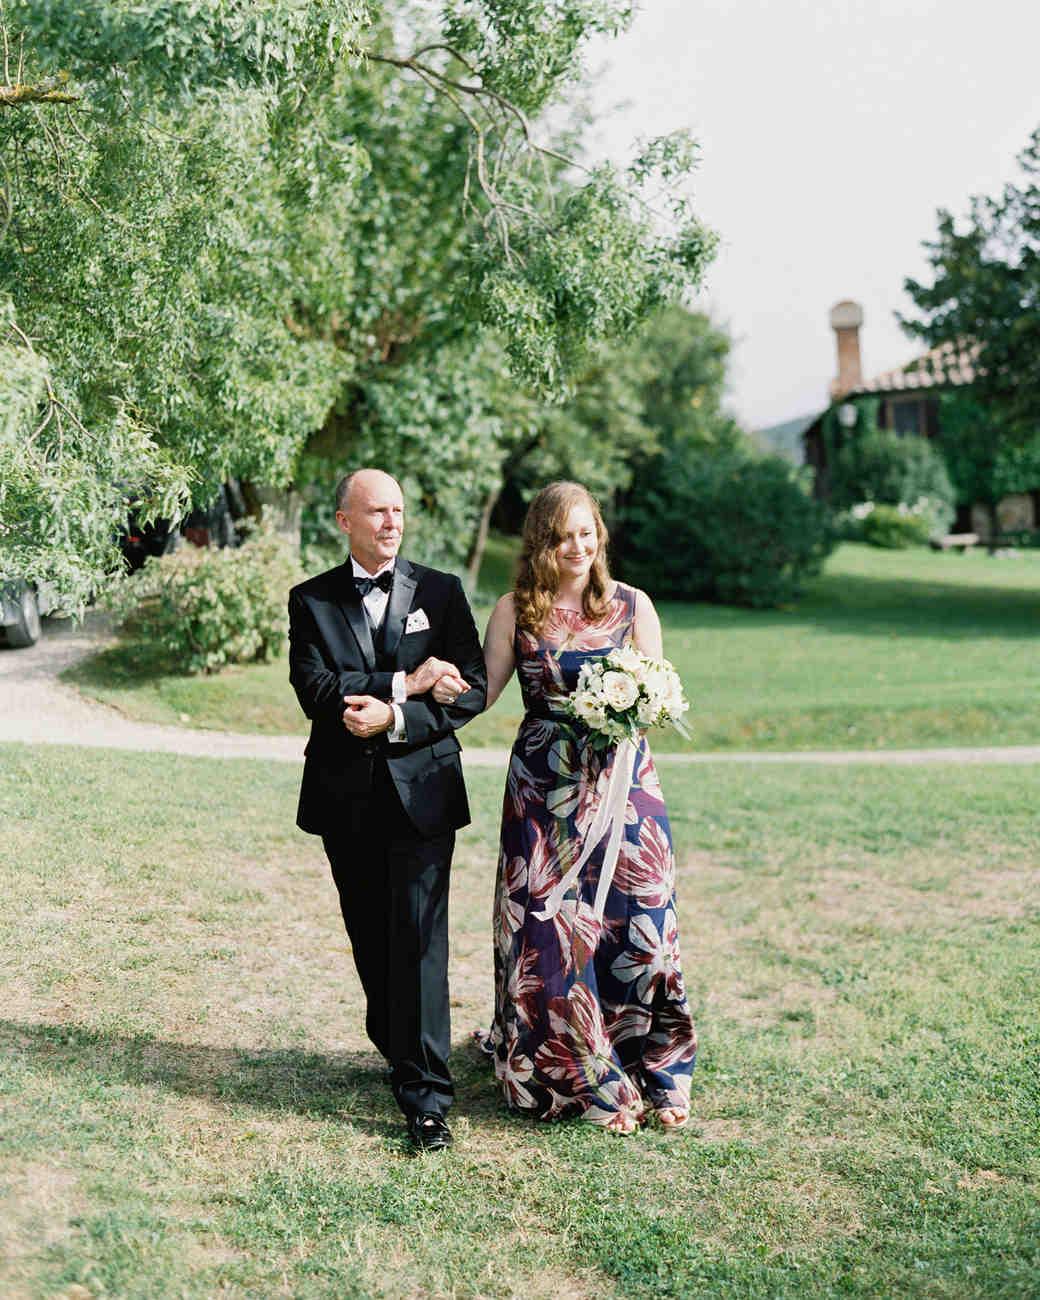 christine-dagan-wedding-processional-4313_10-s113011-0616.jpg